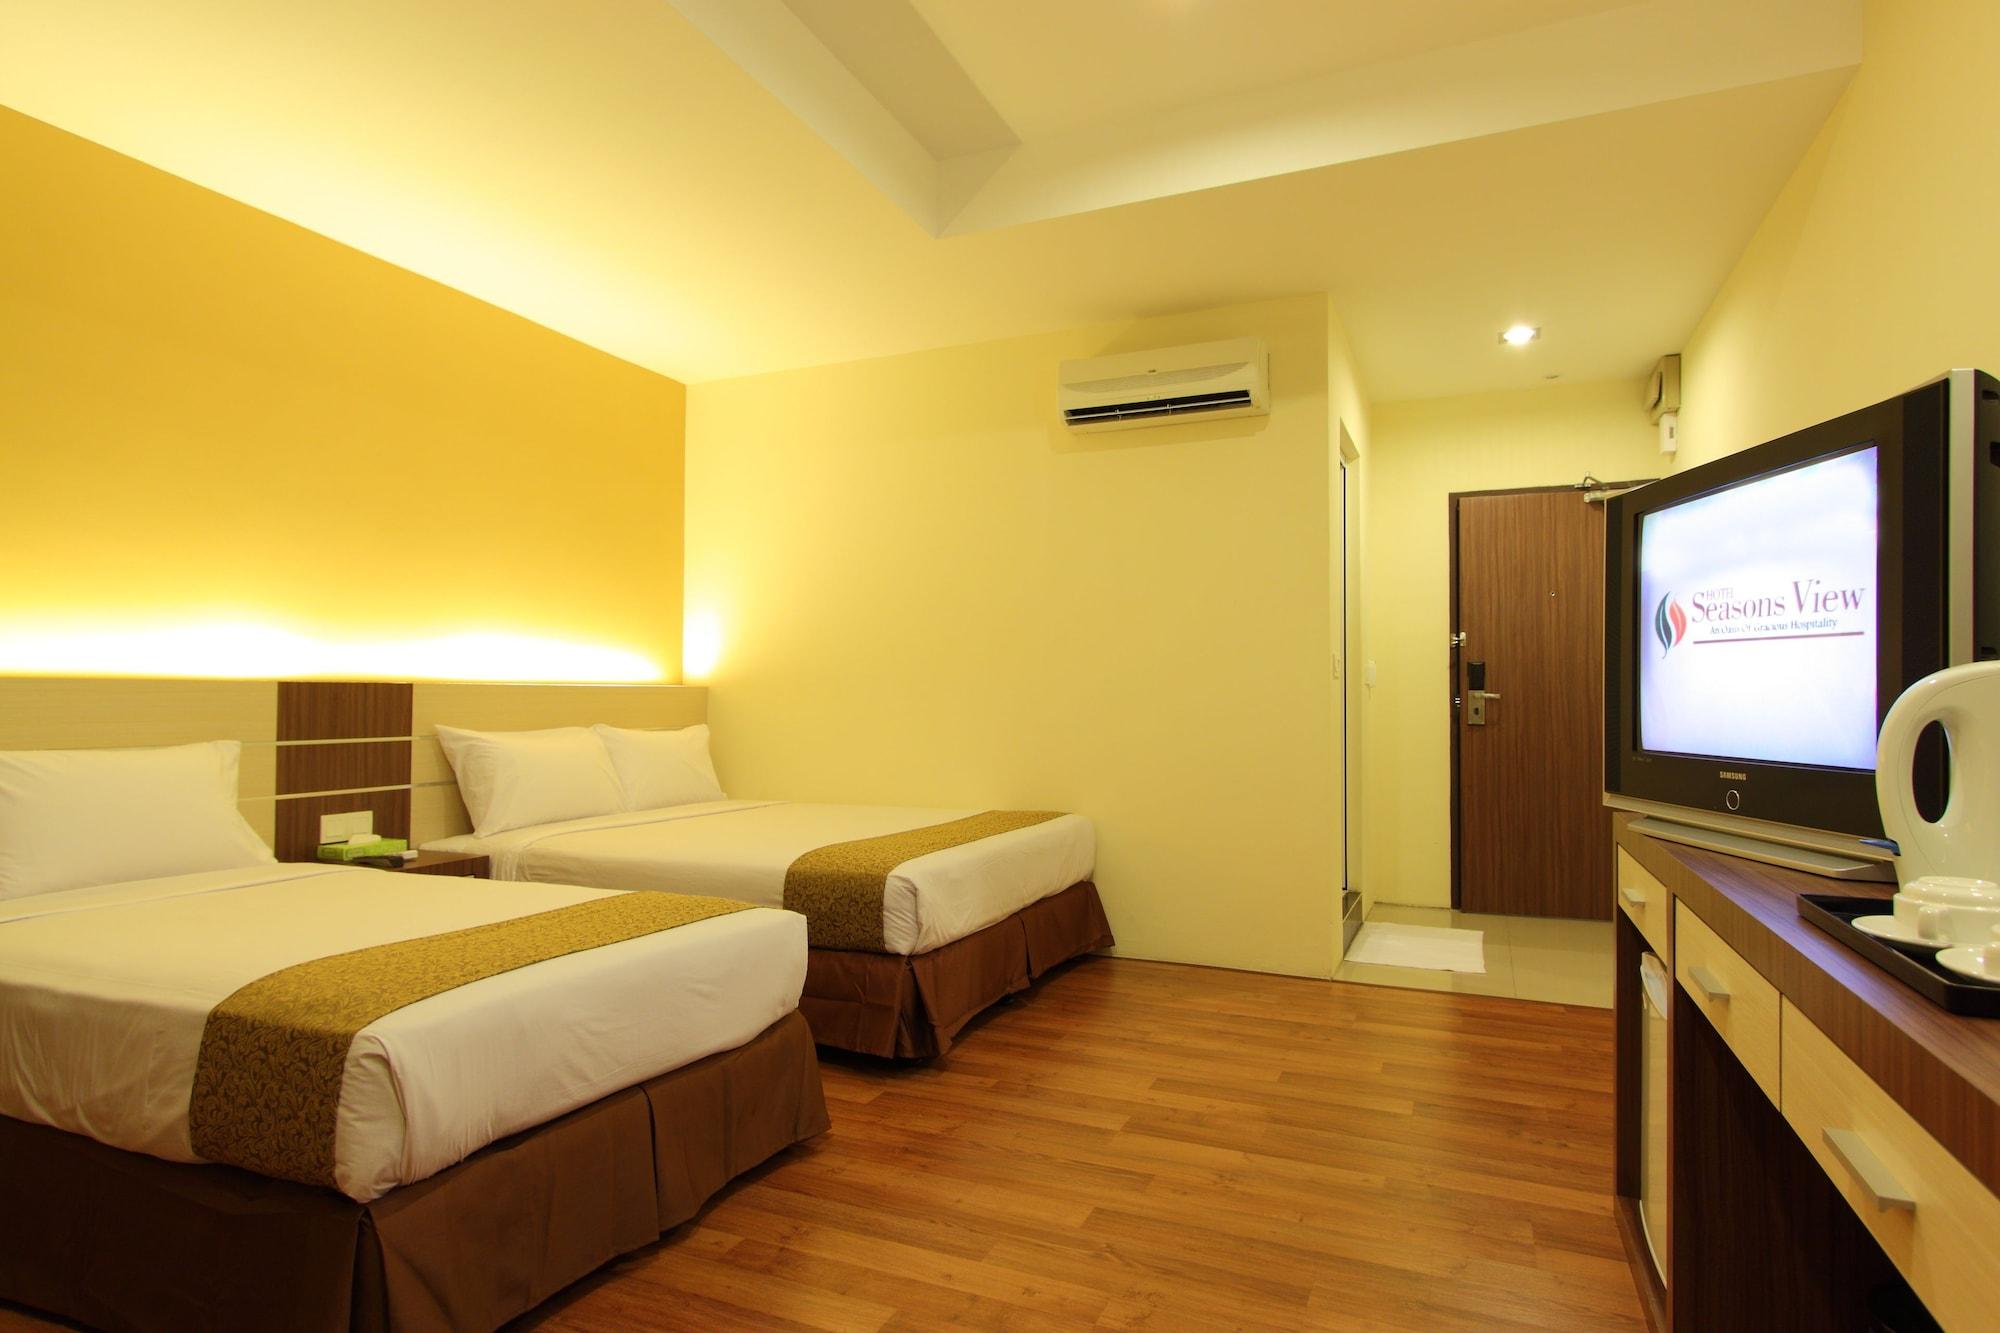 Seasons View Hotel, Kuantan